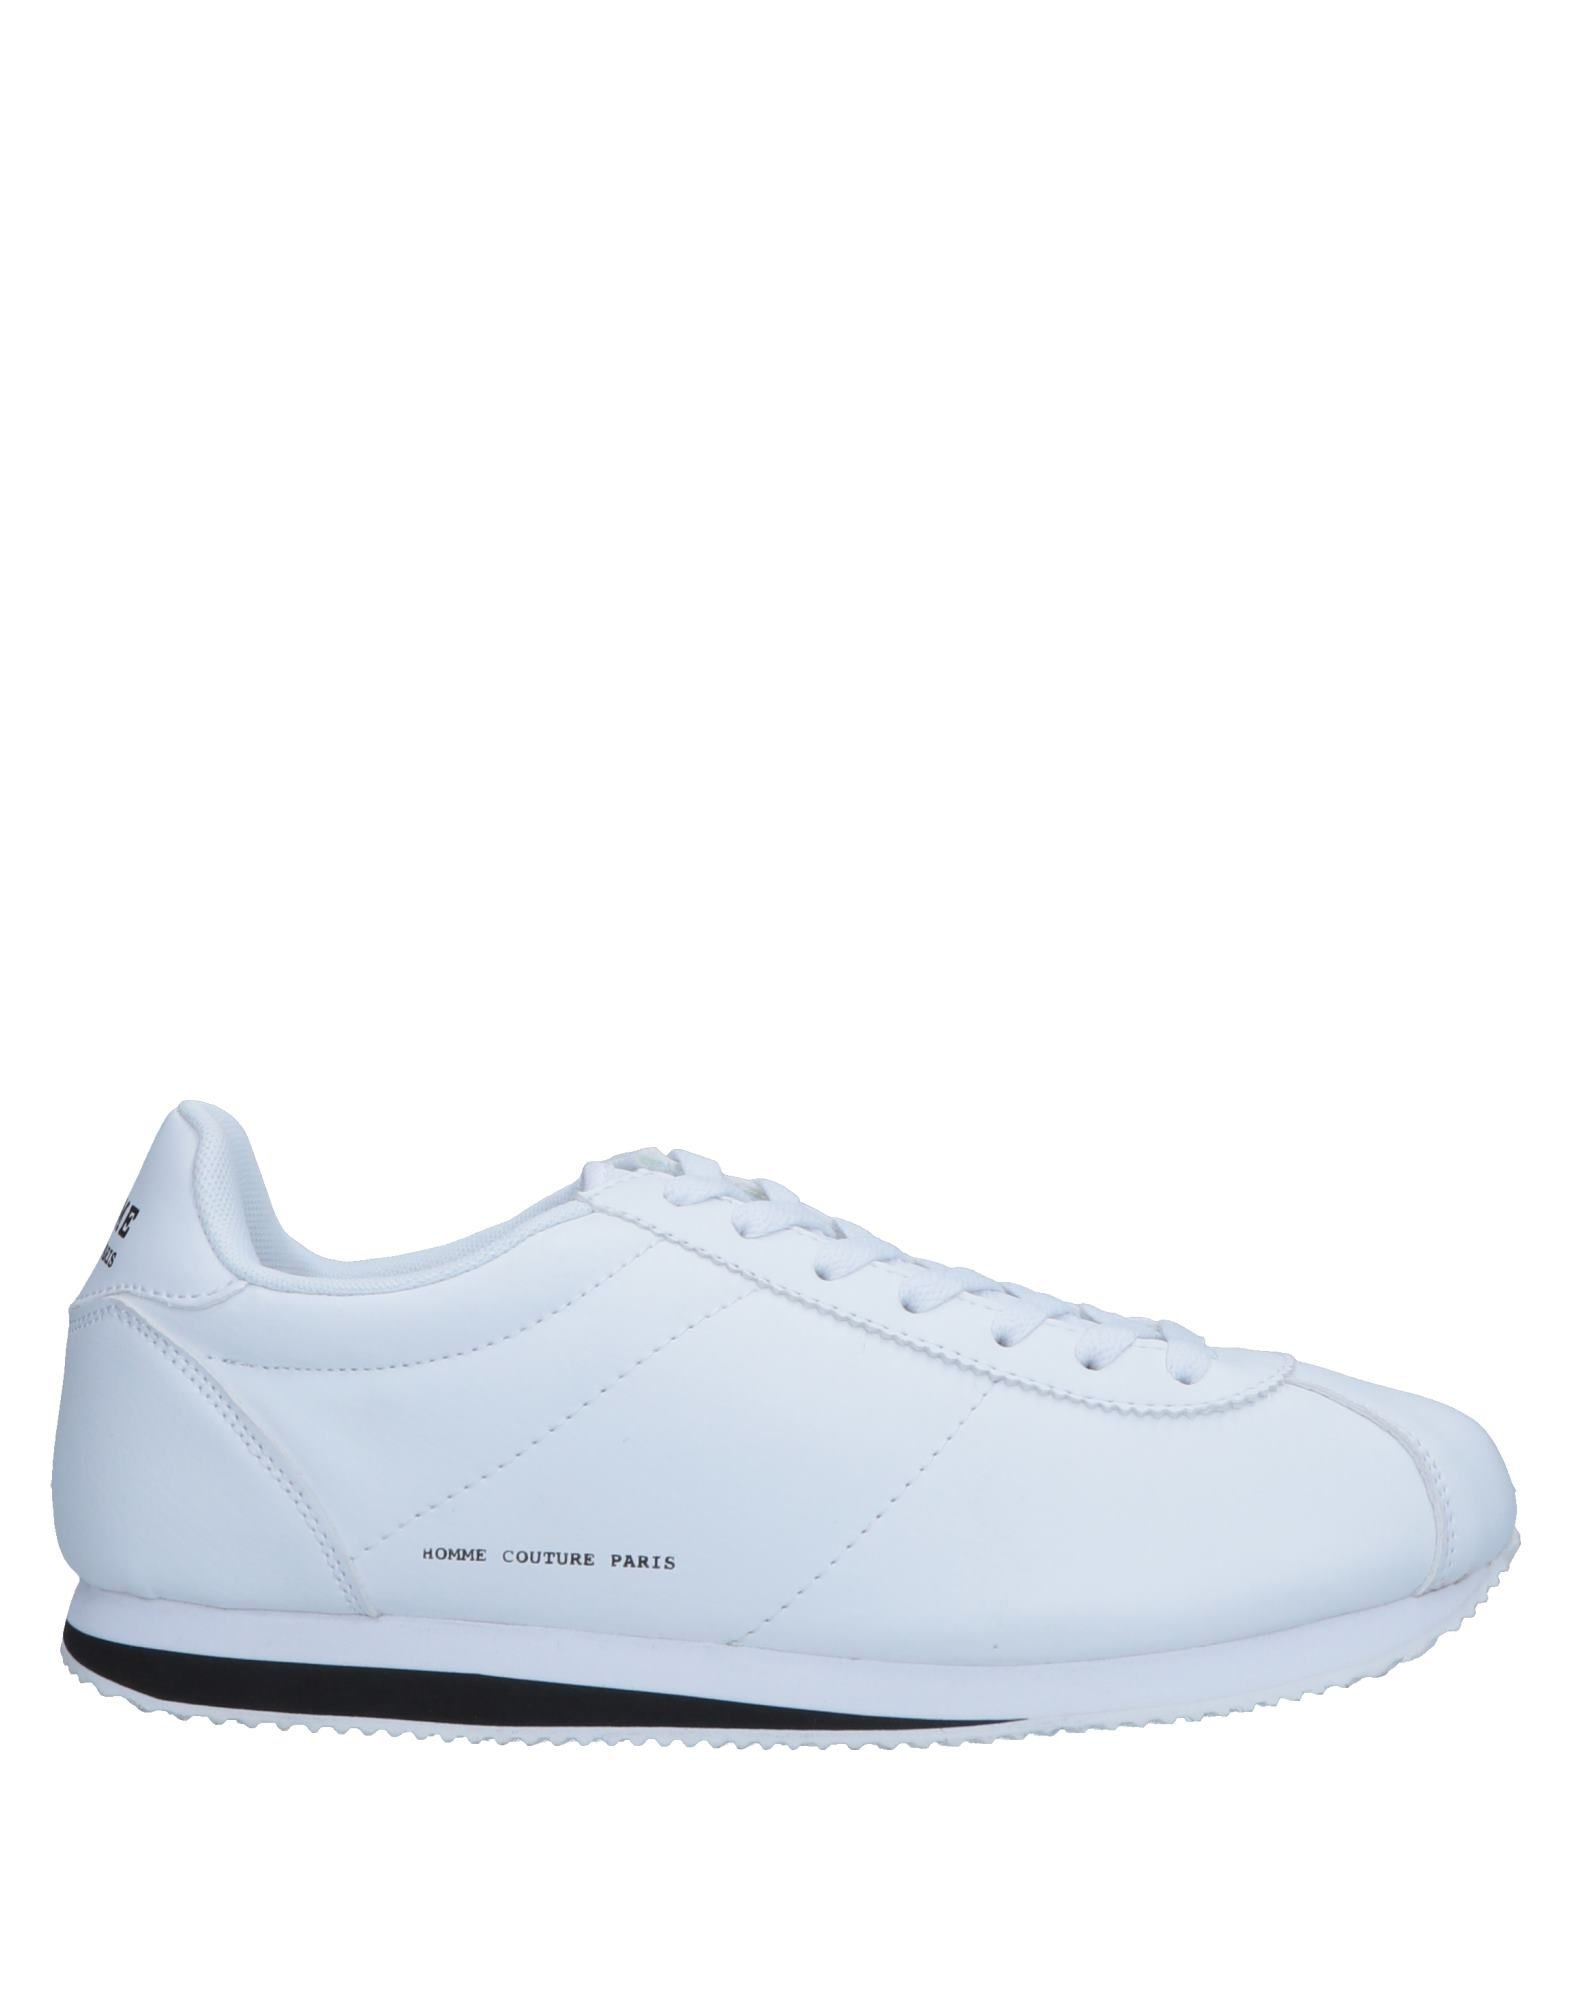 Rabatt echte Schuhe Herren Daniele Alessandrini Homme Sneakers Herren Schuhe  11557179IA 18adaf